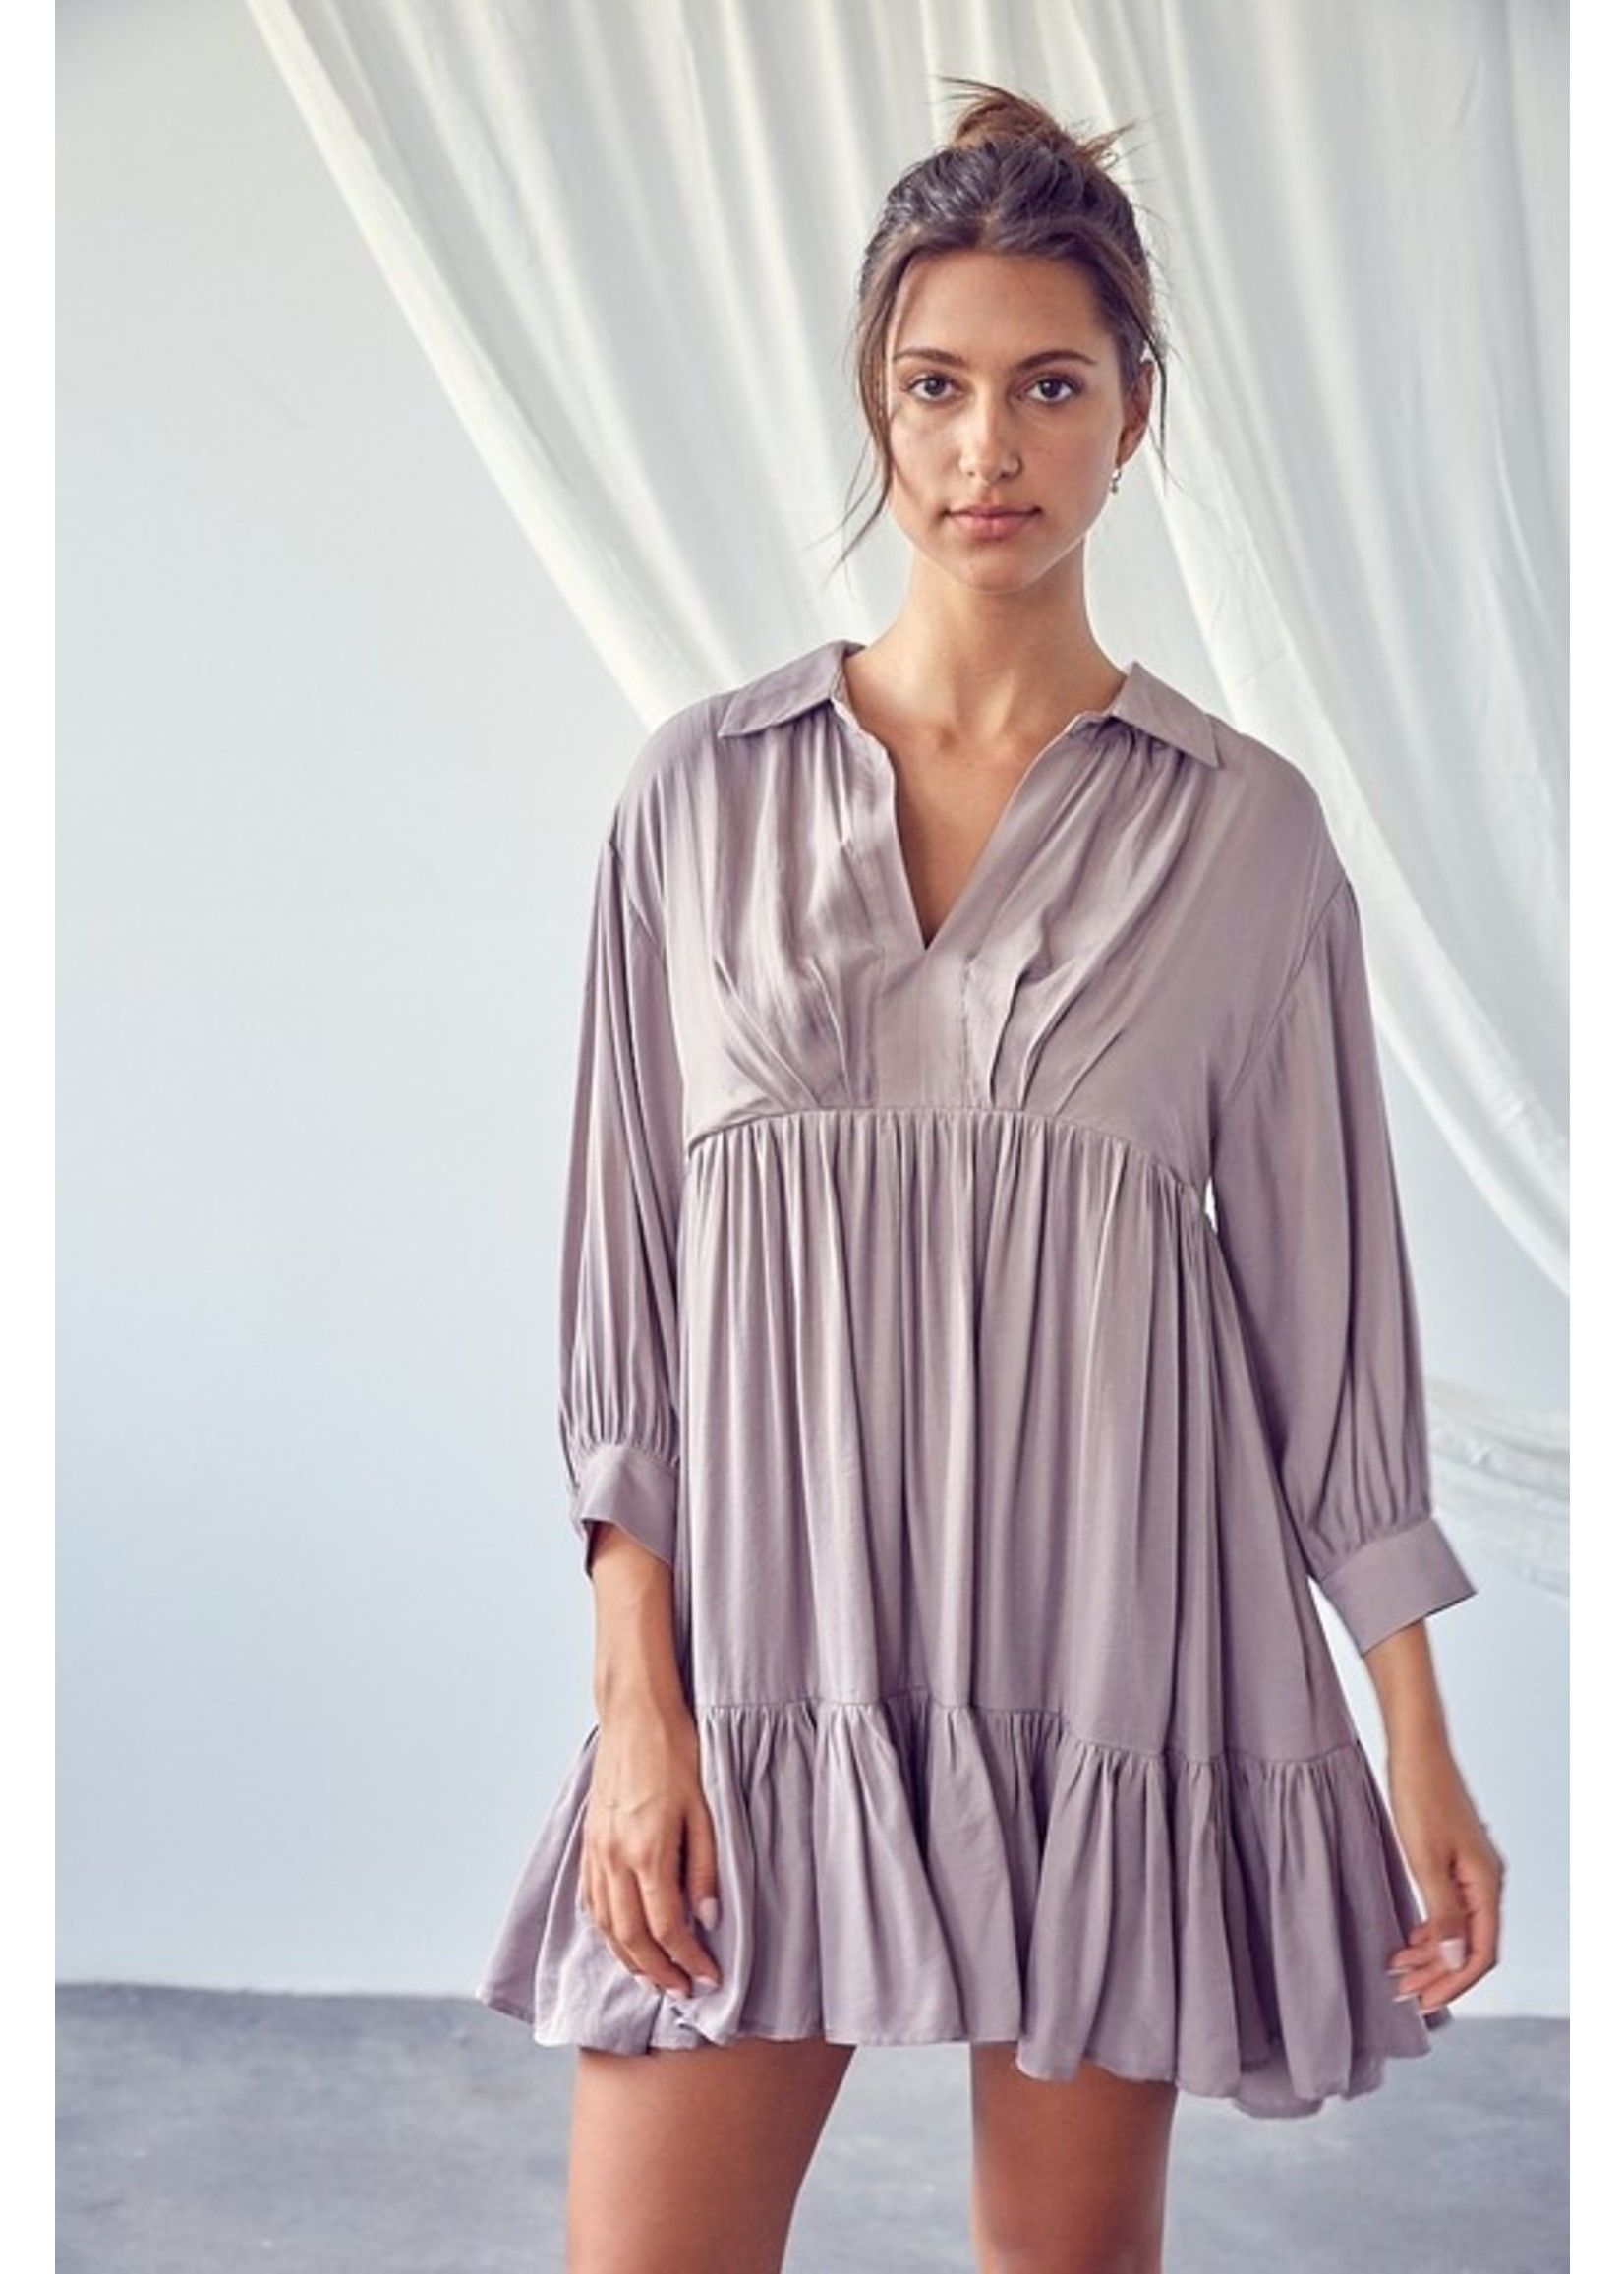 Mustard Seed Flowy Collared Shirt Dress - S17665